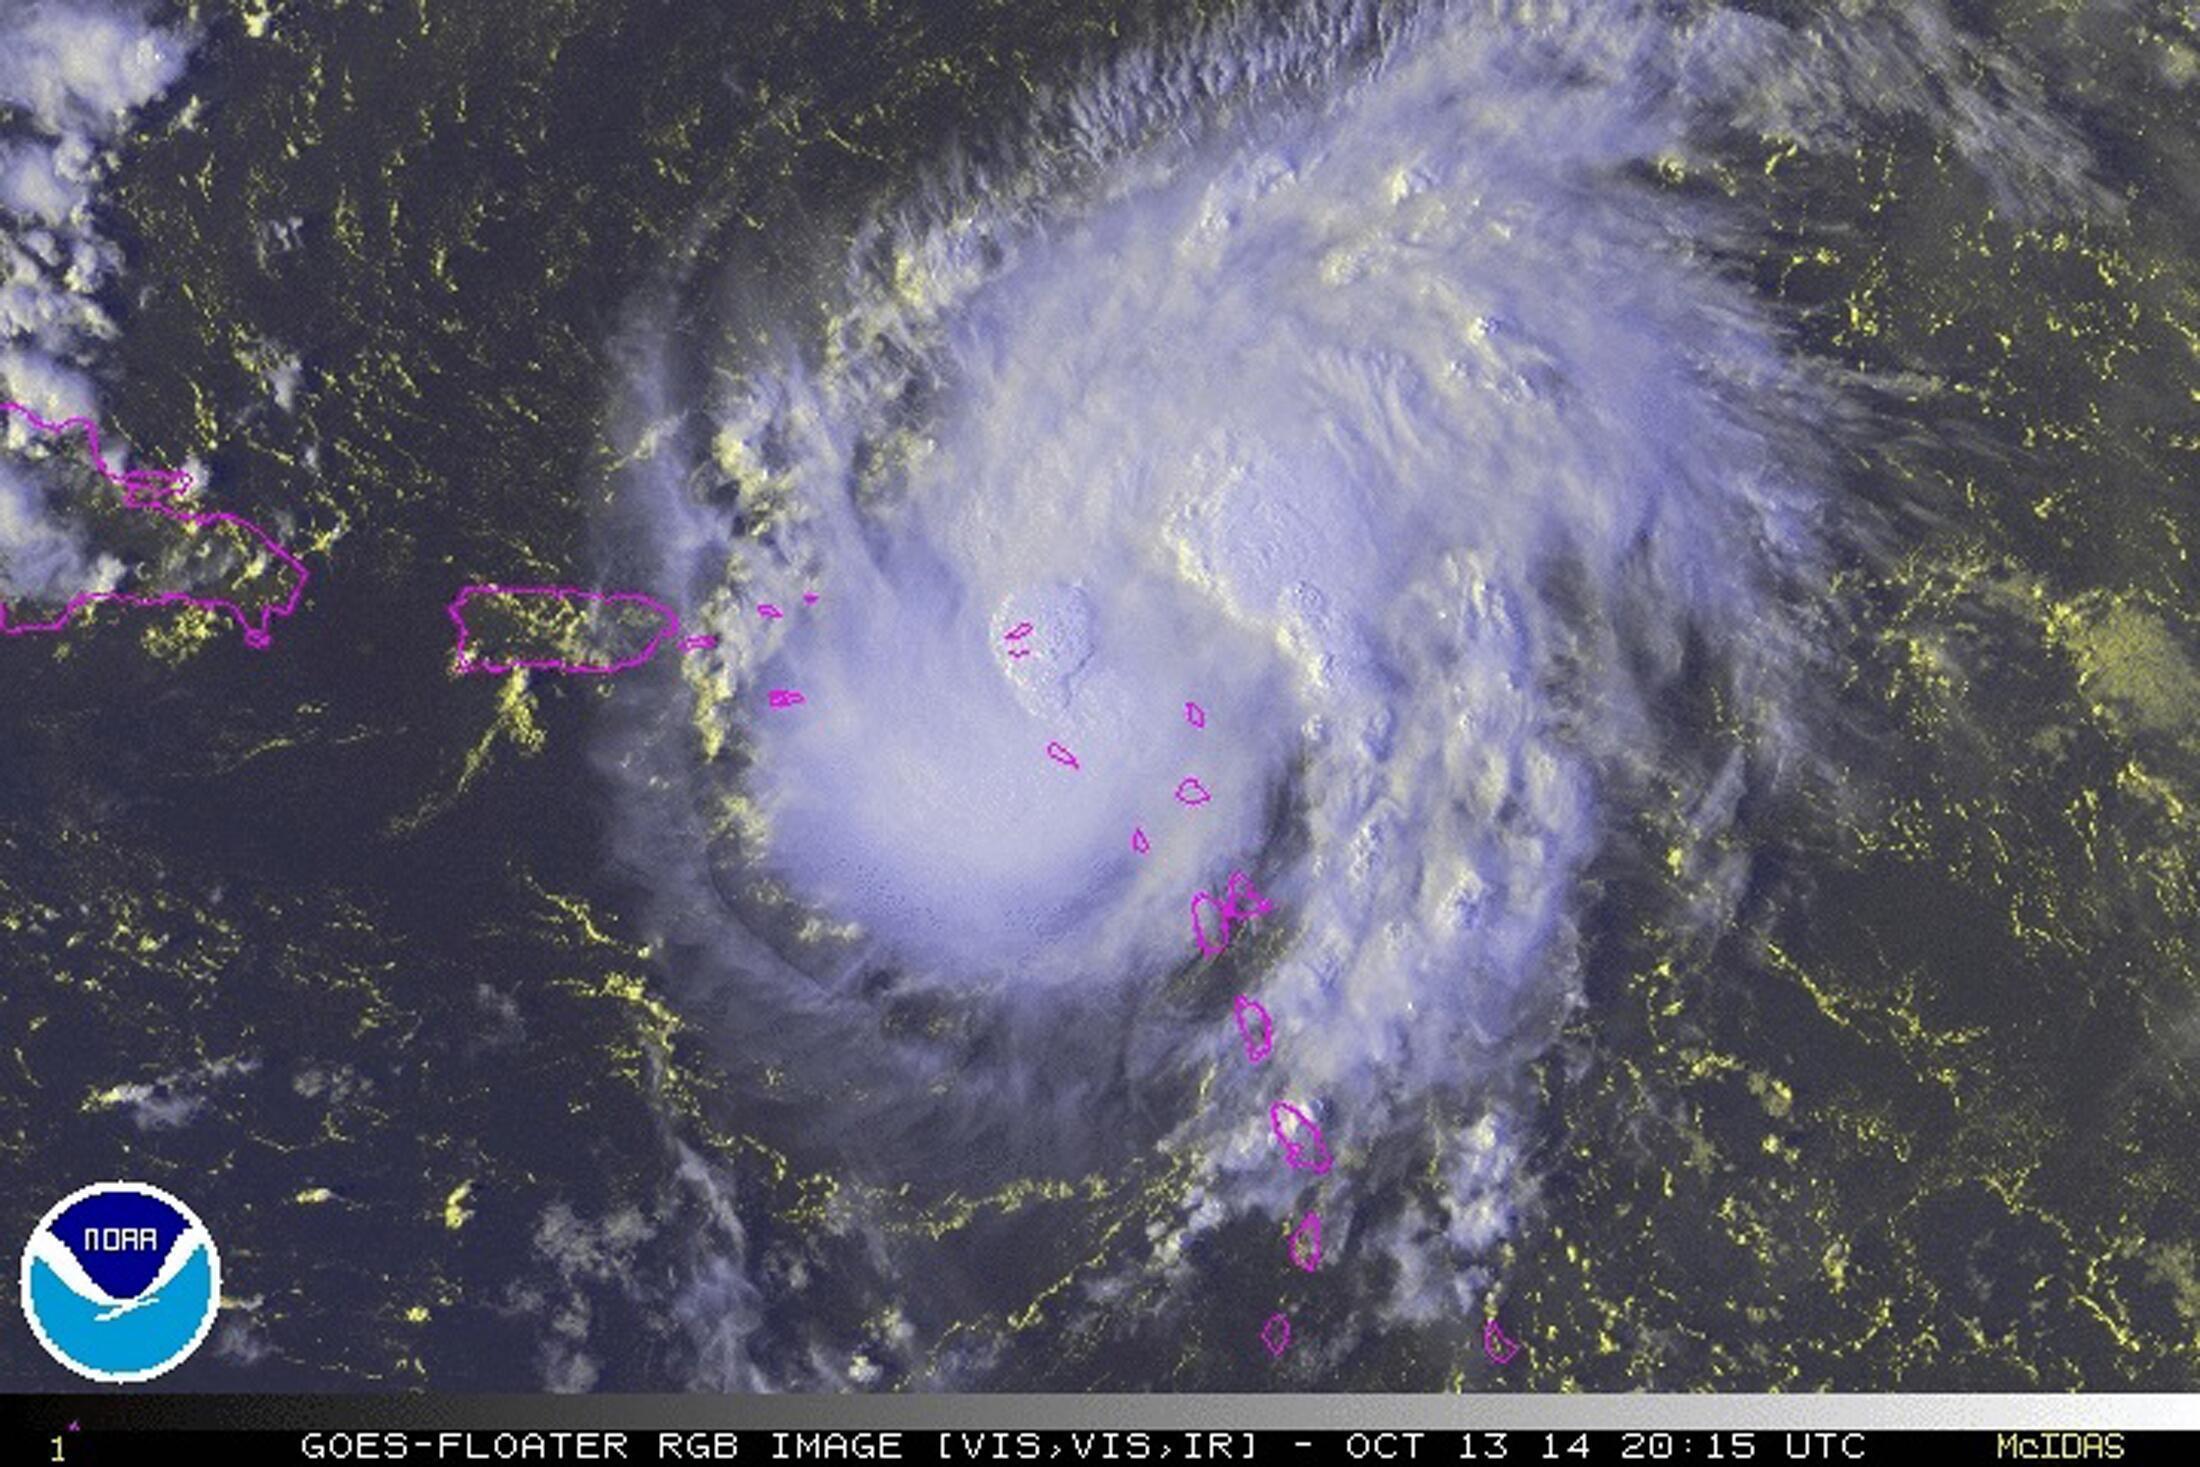 Hurricane Gonzalo over the Caribbean Ocean in a NOAA satellite image, 13 october 2014.